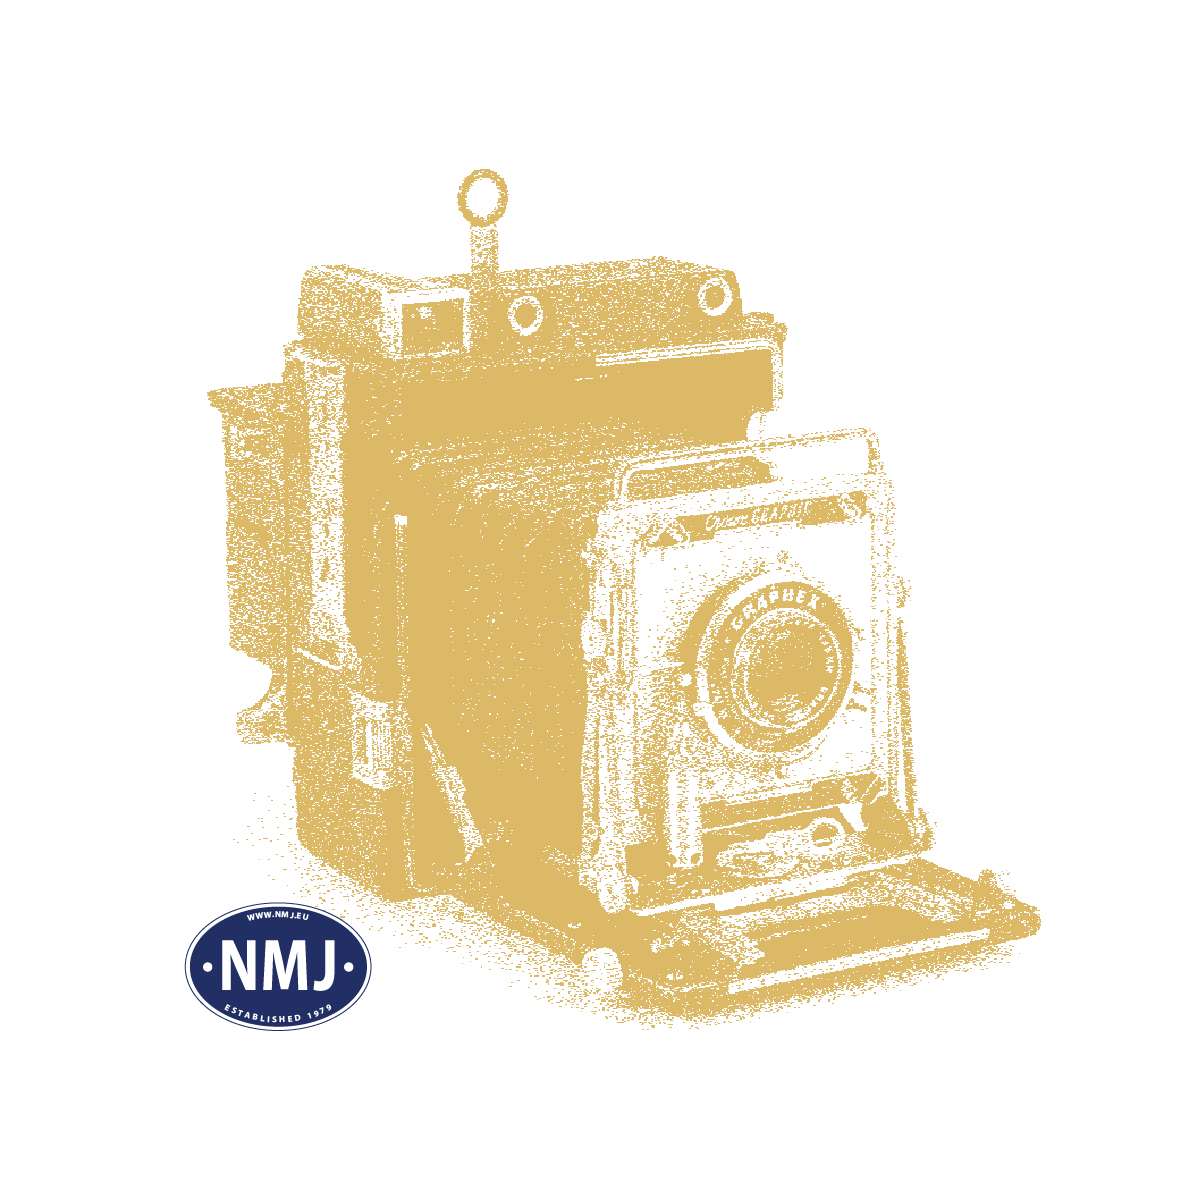 NMJT122.305 - NMJ Topline NSB B7-6 27027